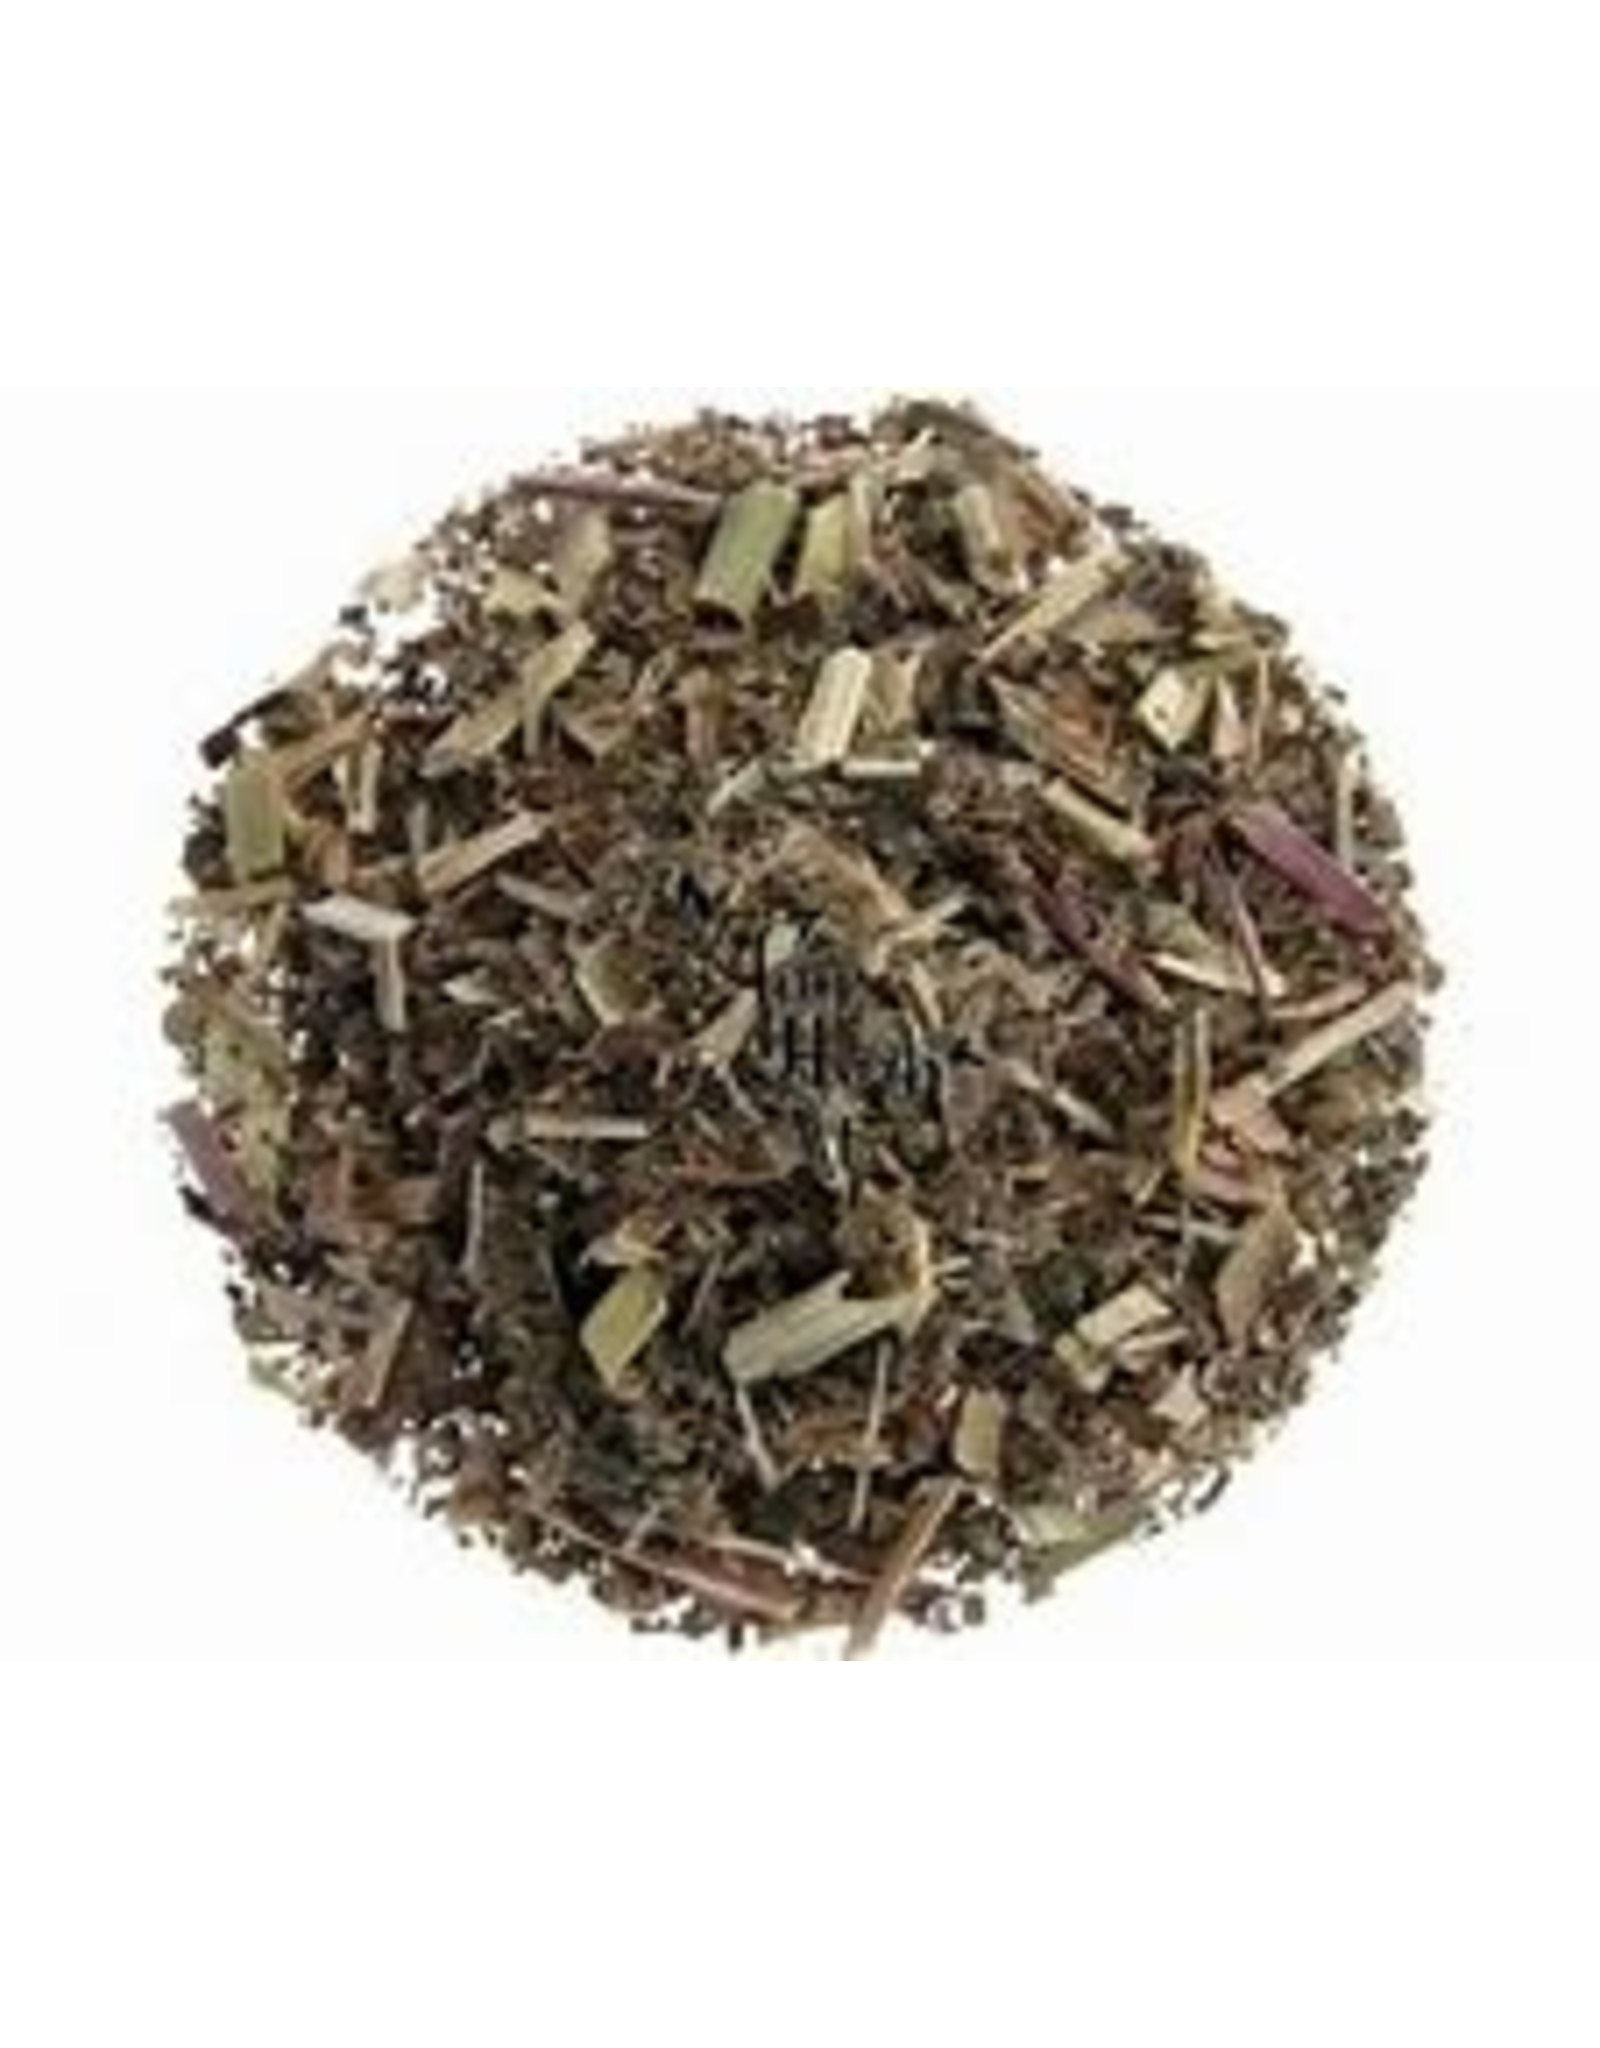 Meadowsweet herb 1 oz